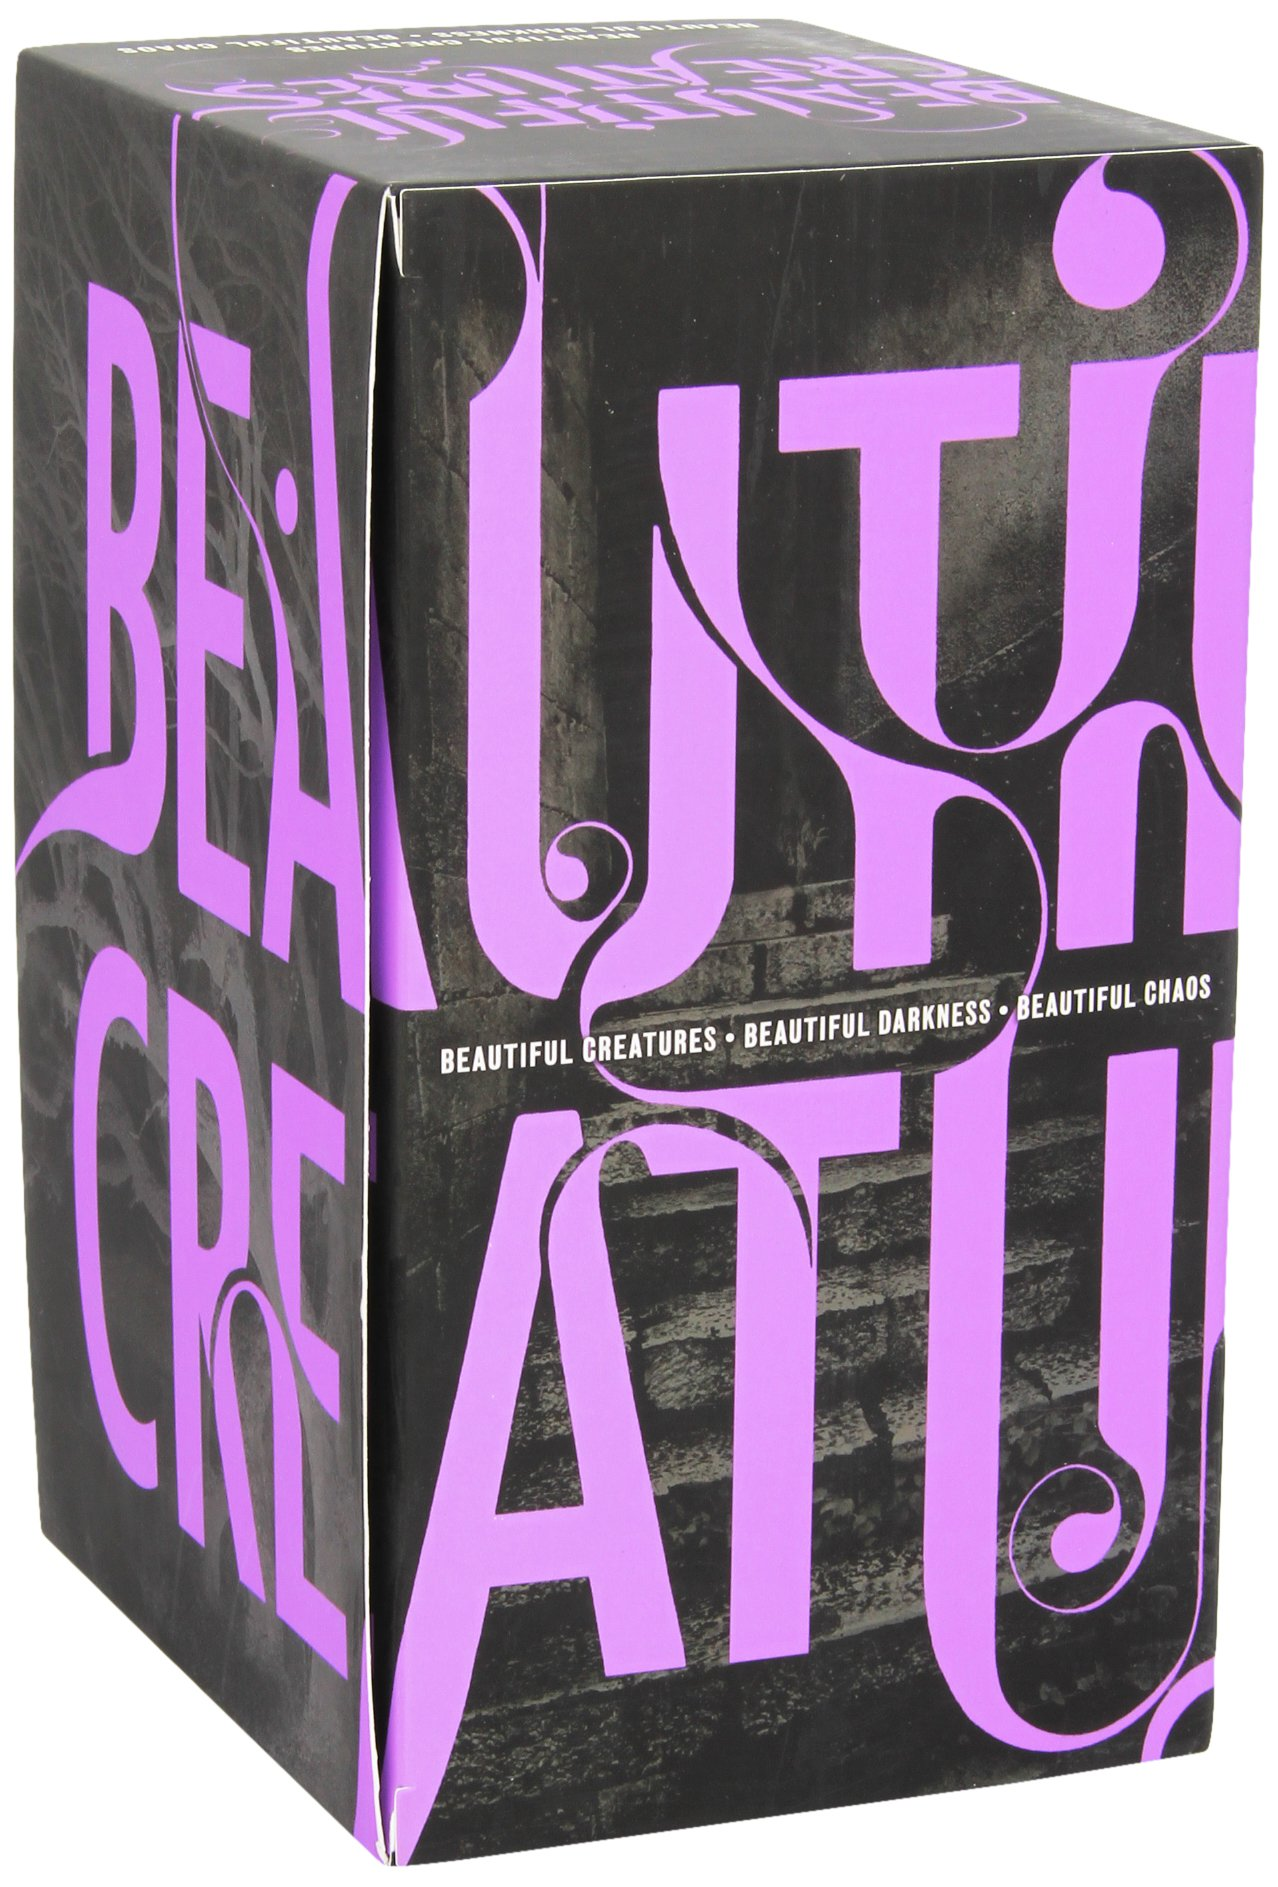 The Beautiful Creatures Paperback Set: Beautiful Creatures, Beautiful Darkness, Beautiful Chaos pdf